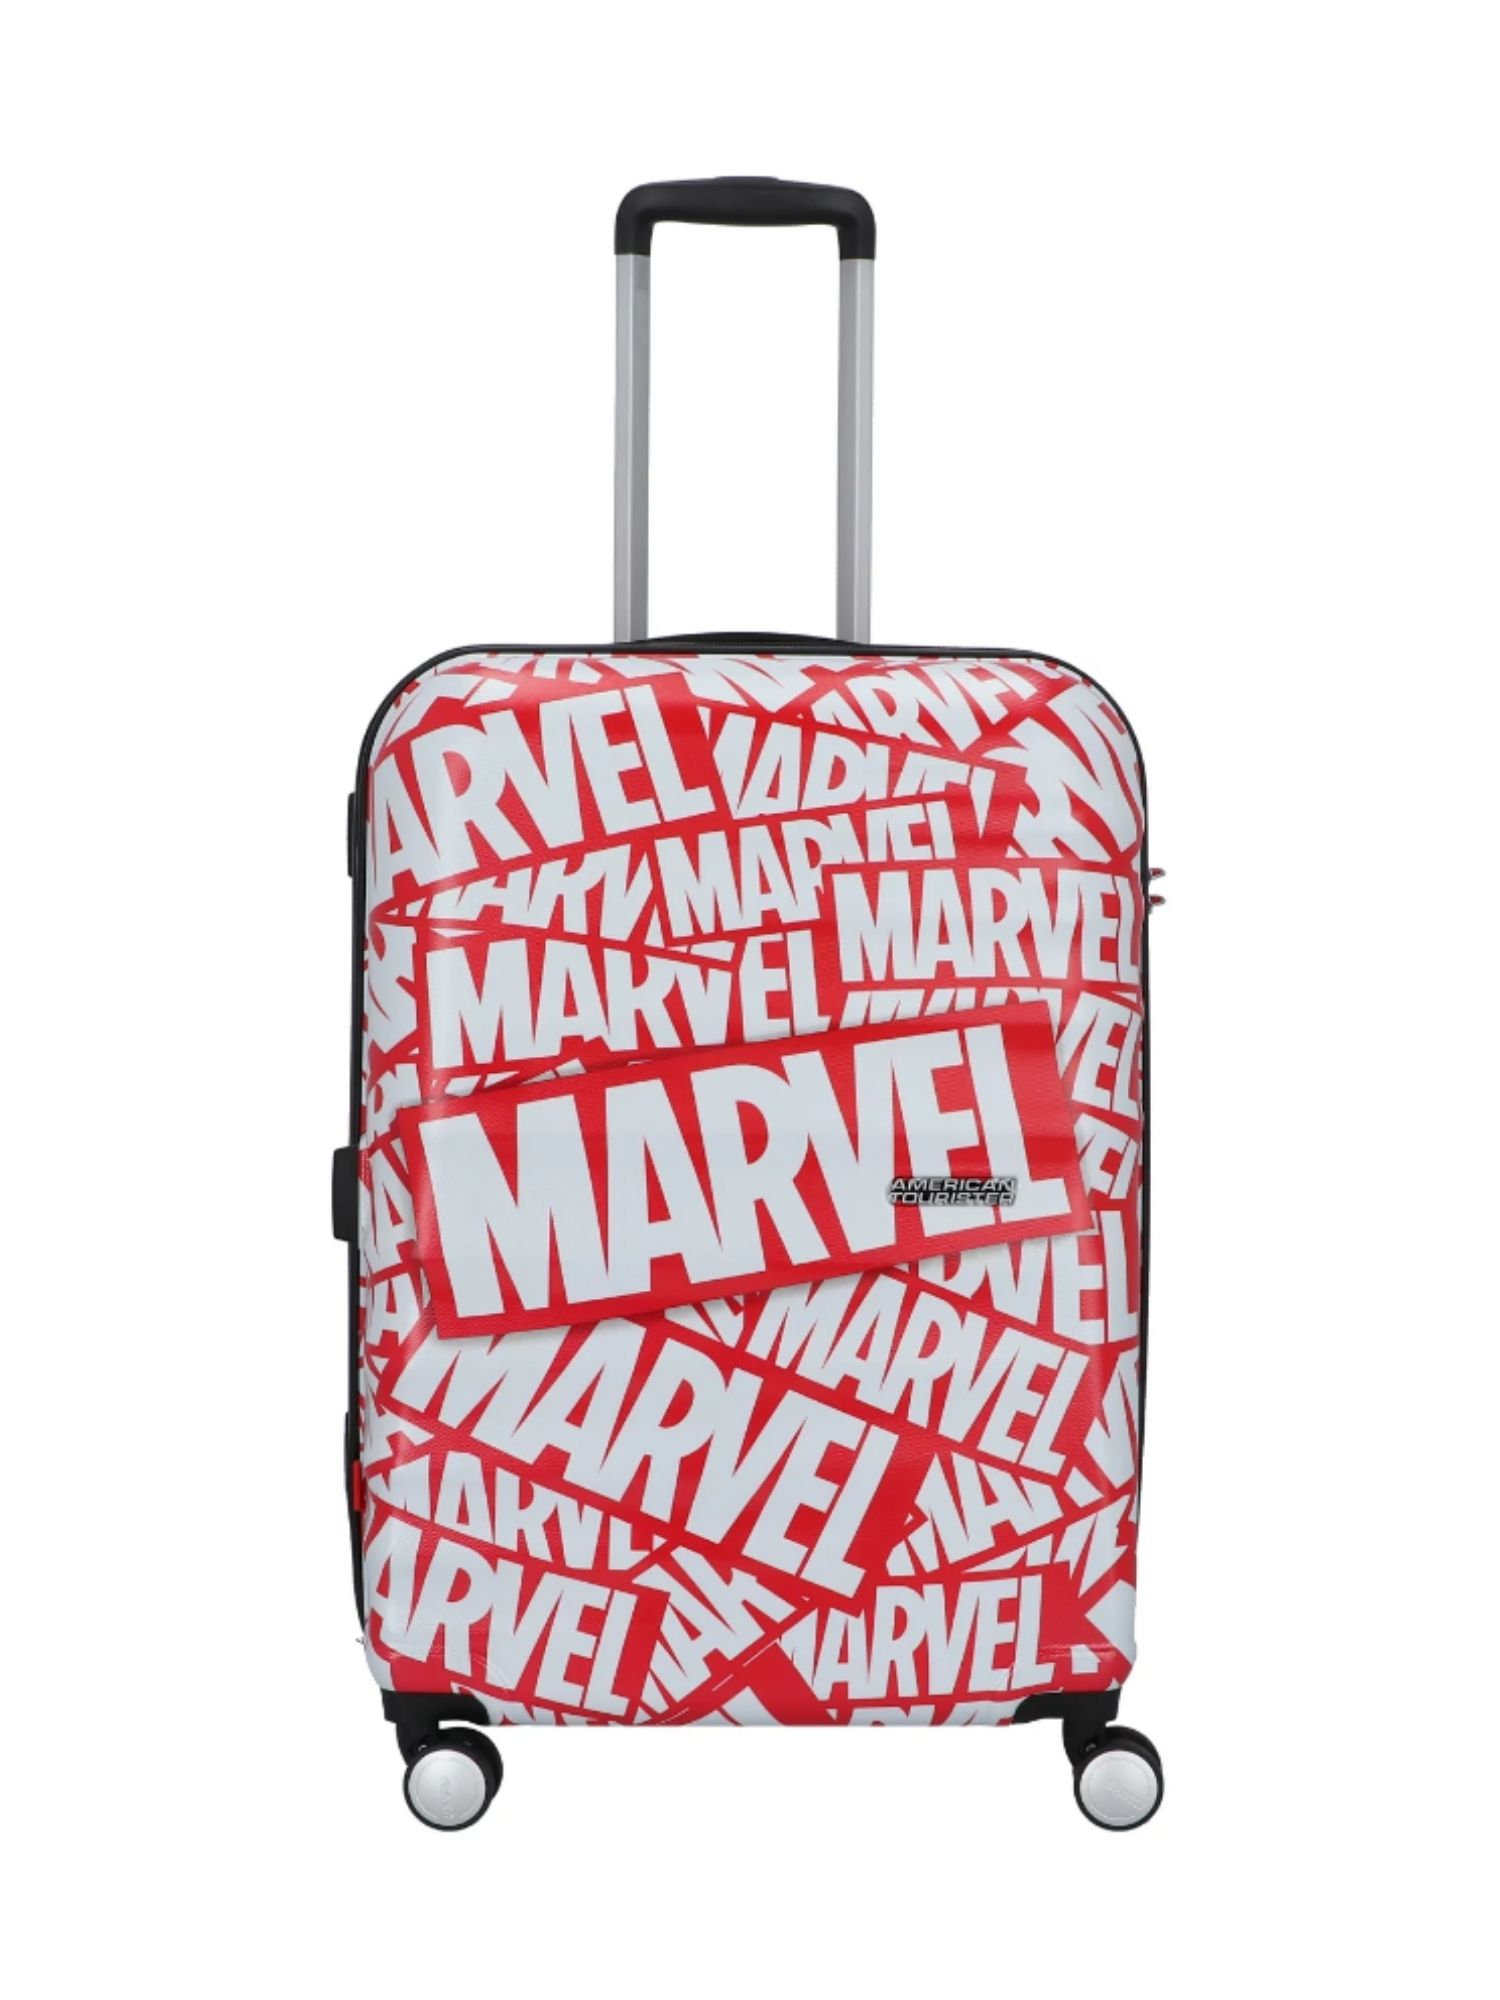 Trolley American Tourister 4 ruote 55 cm. Wavebreaker Disney Marvel Logo